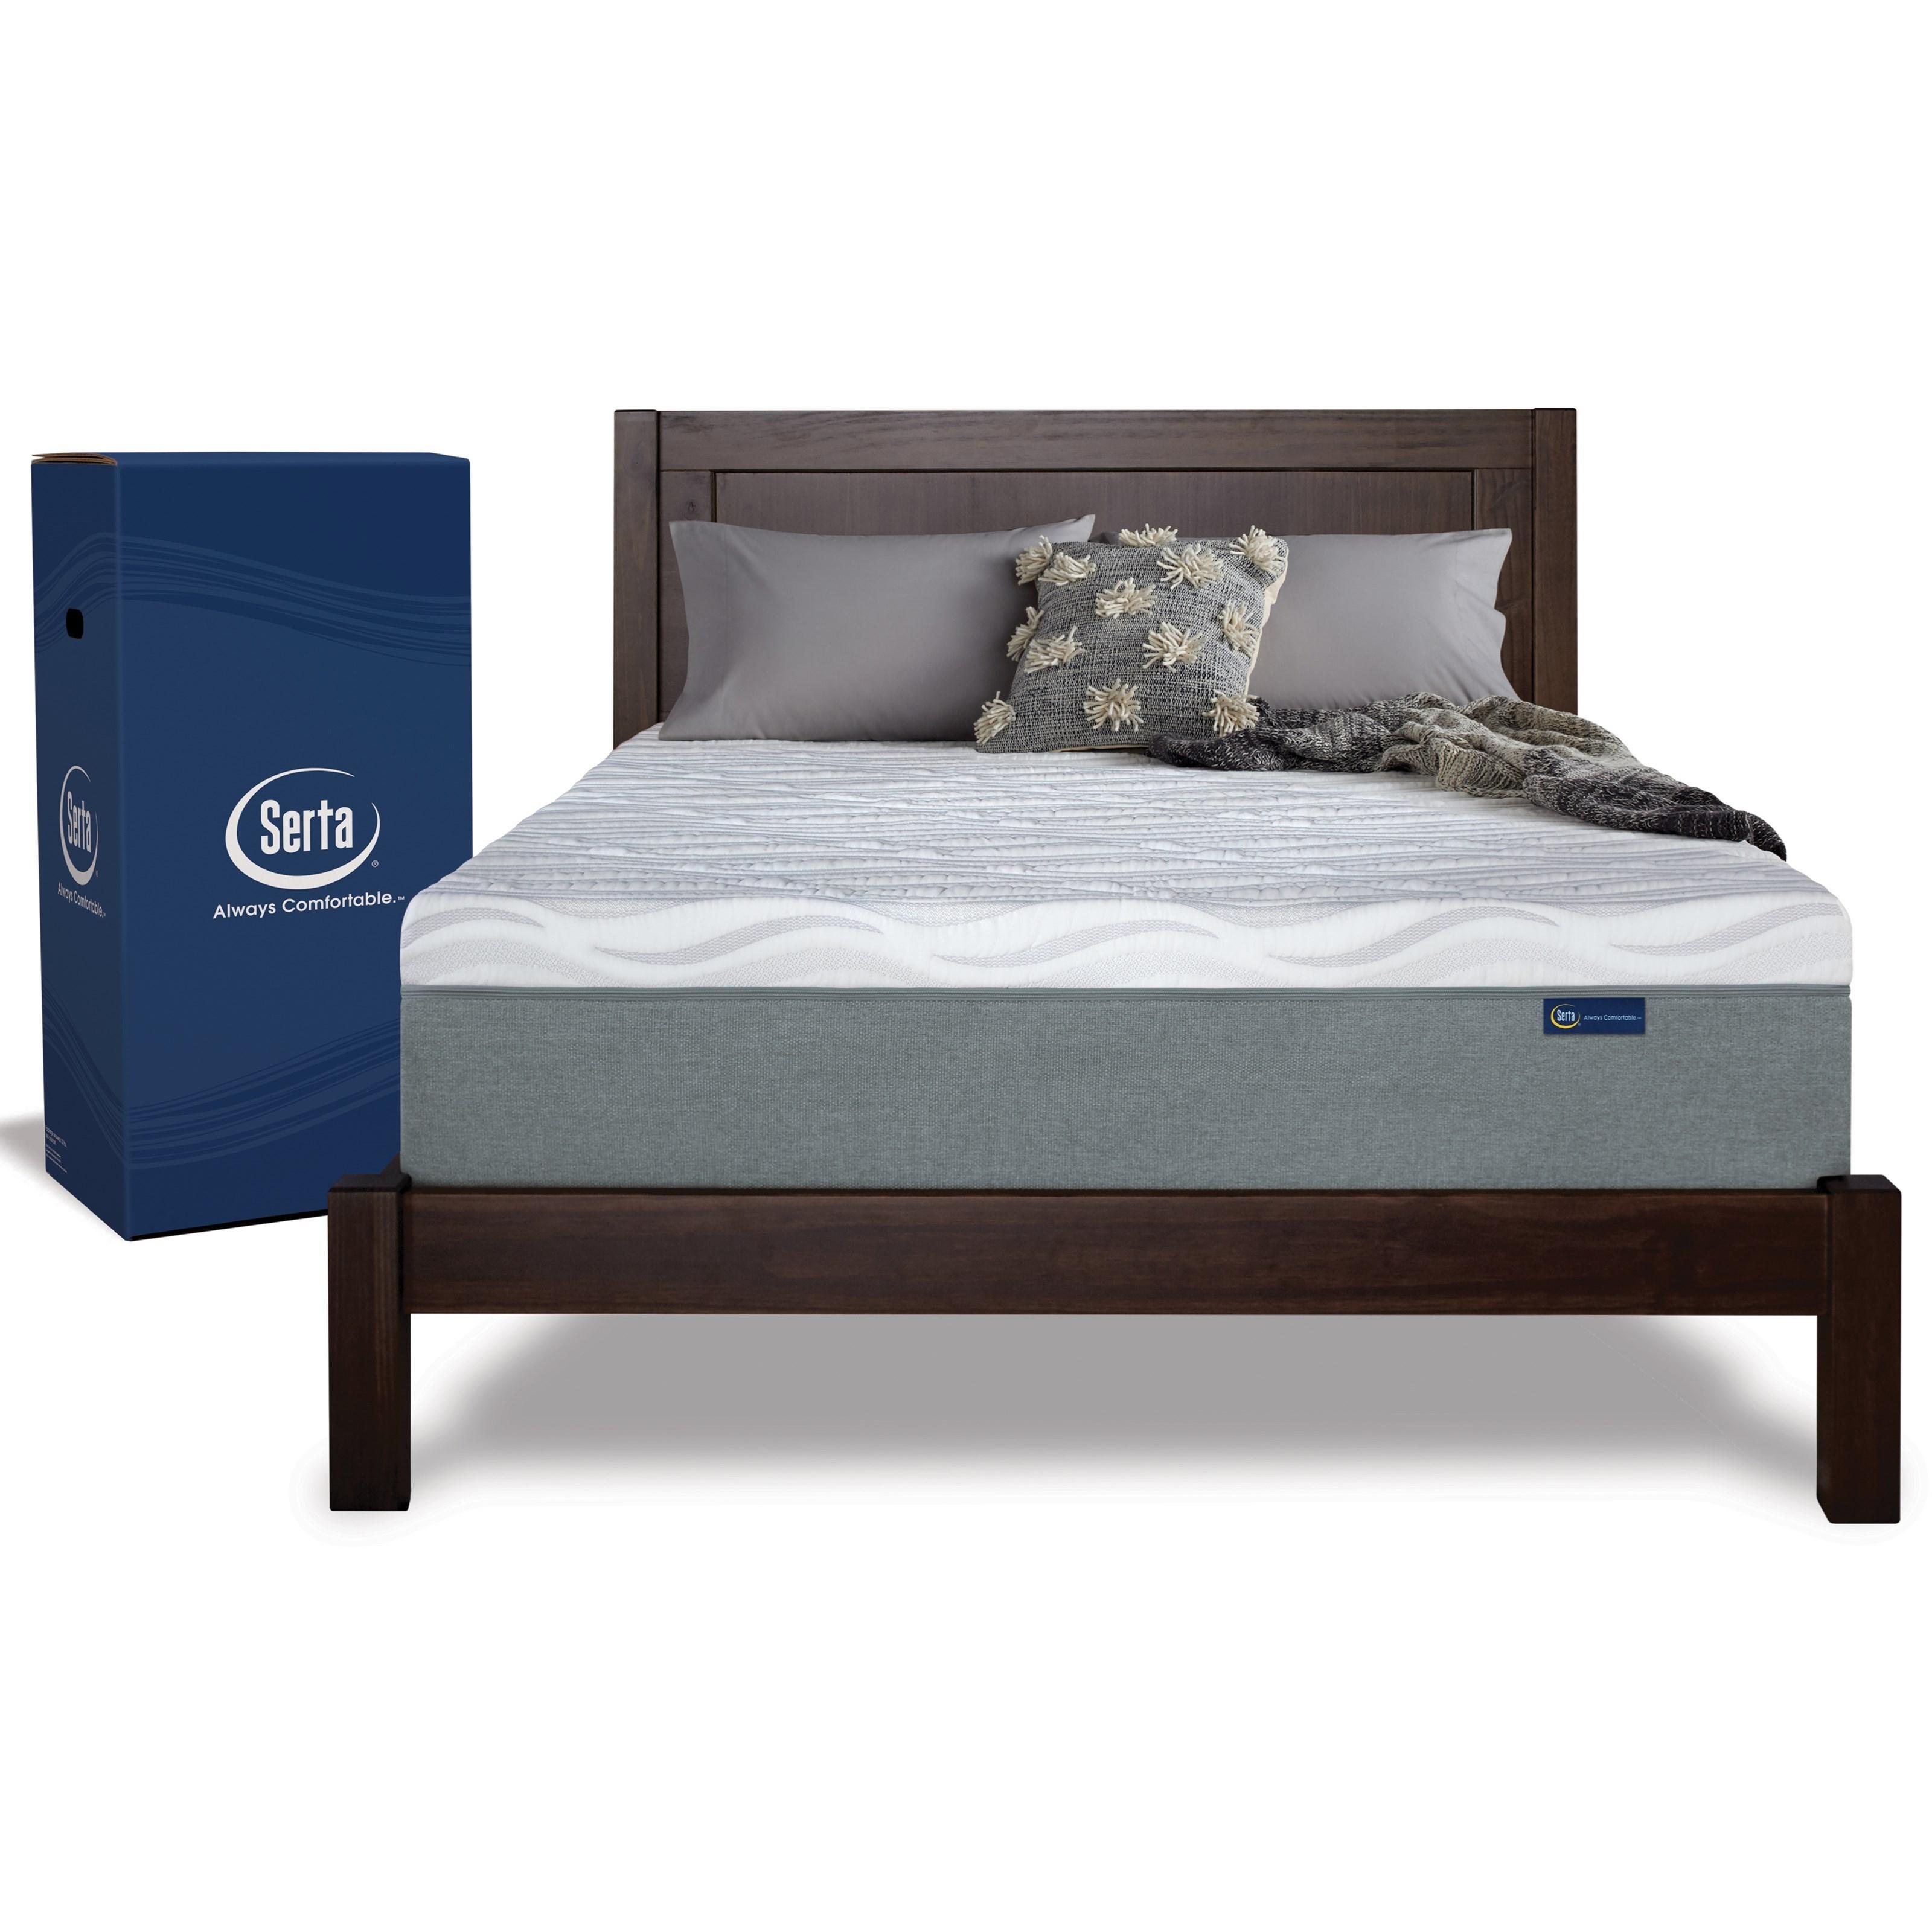 Premium Serta Queen Firm Mattress in a Box by Serta at HomeWorld Furniture